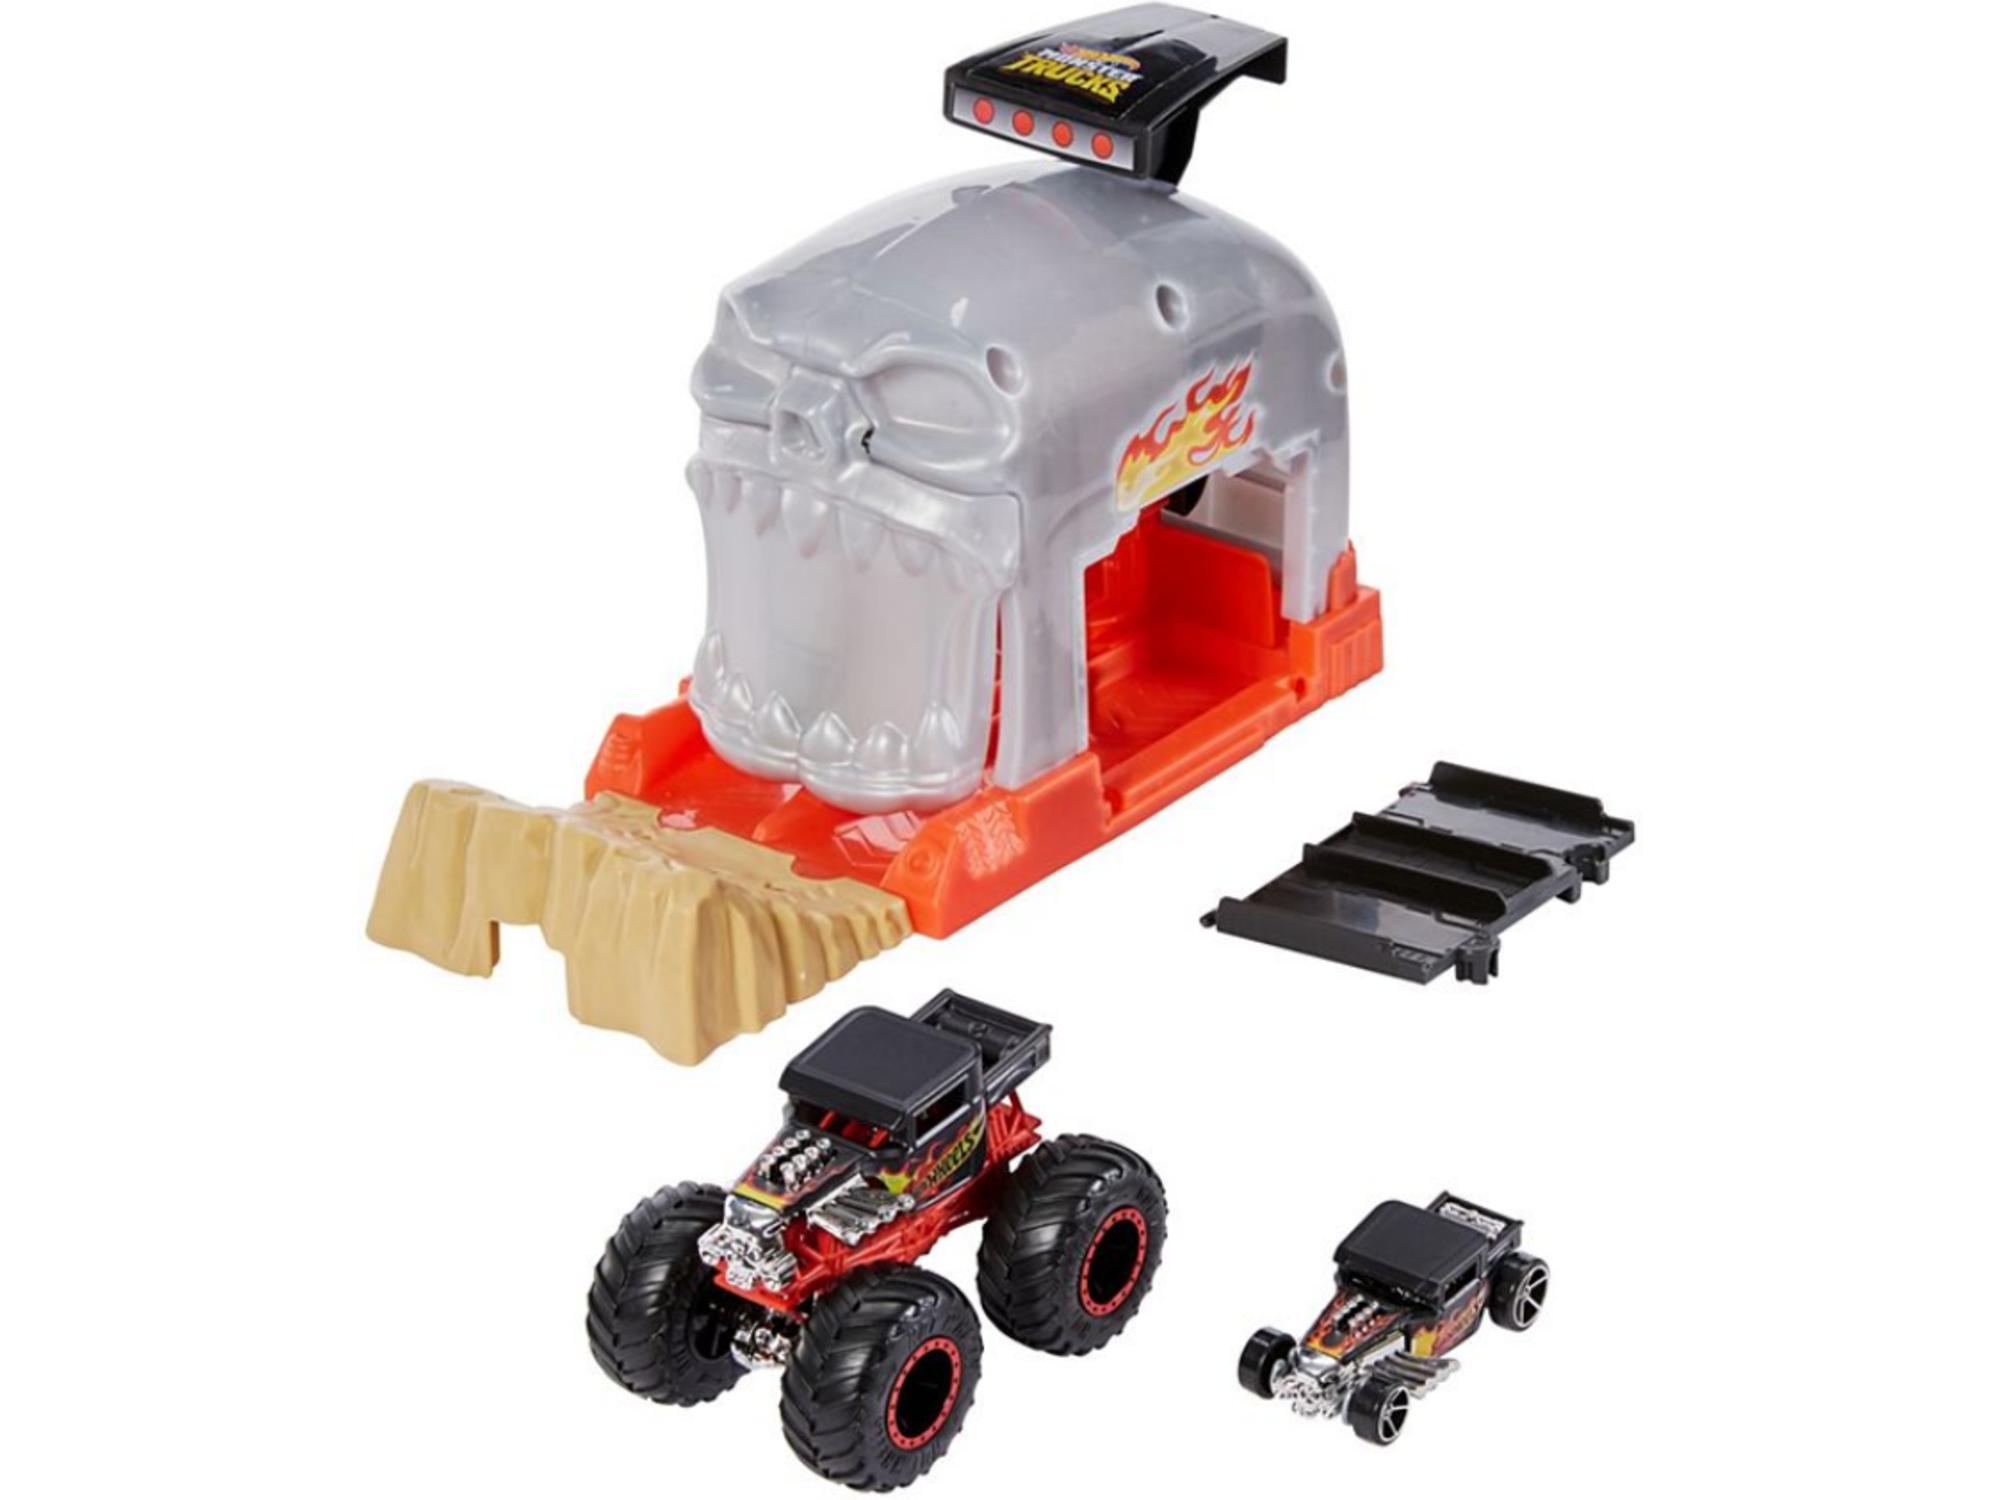 MATTEL monster set Hot wheels GKY01 0887961833614